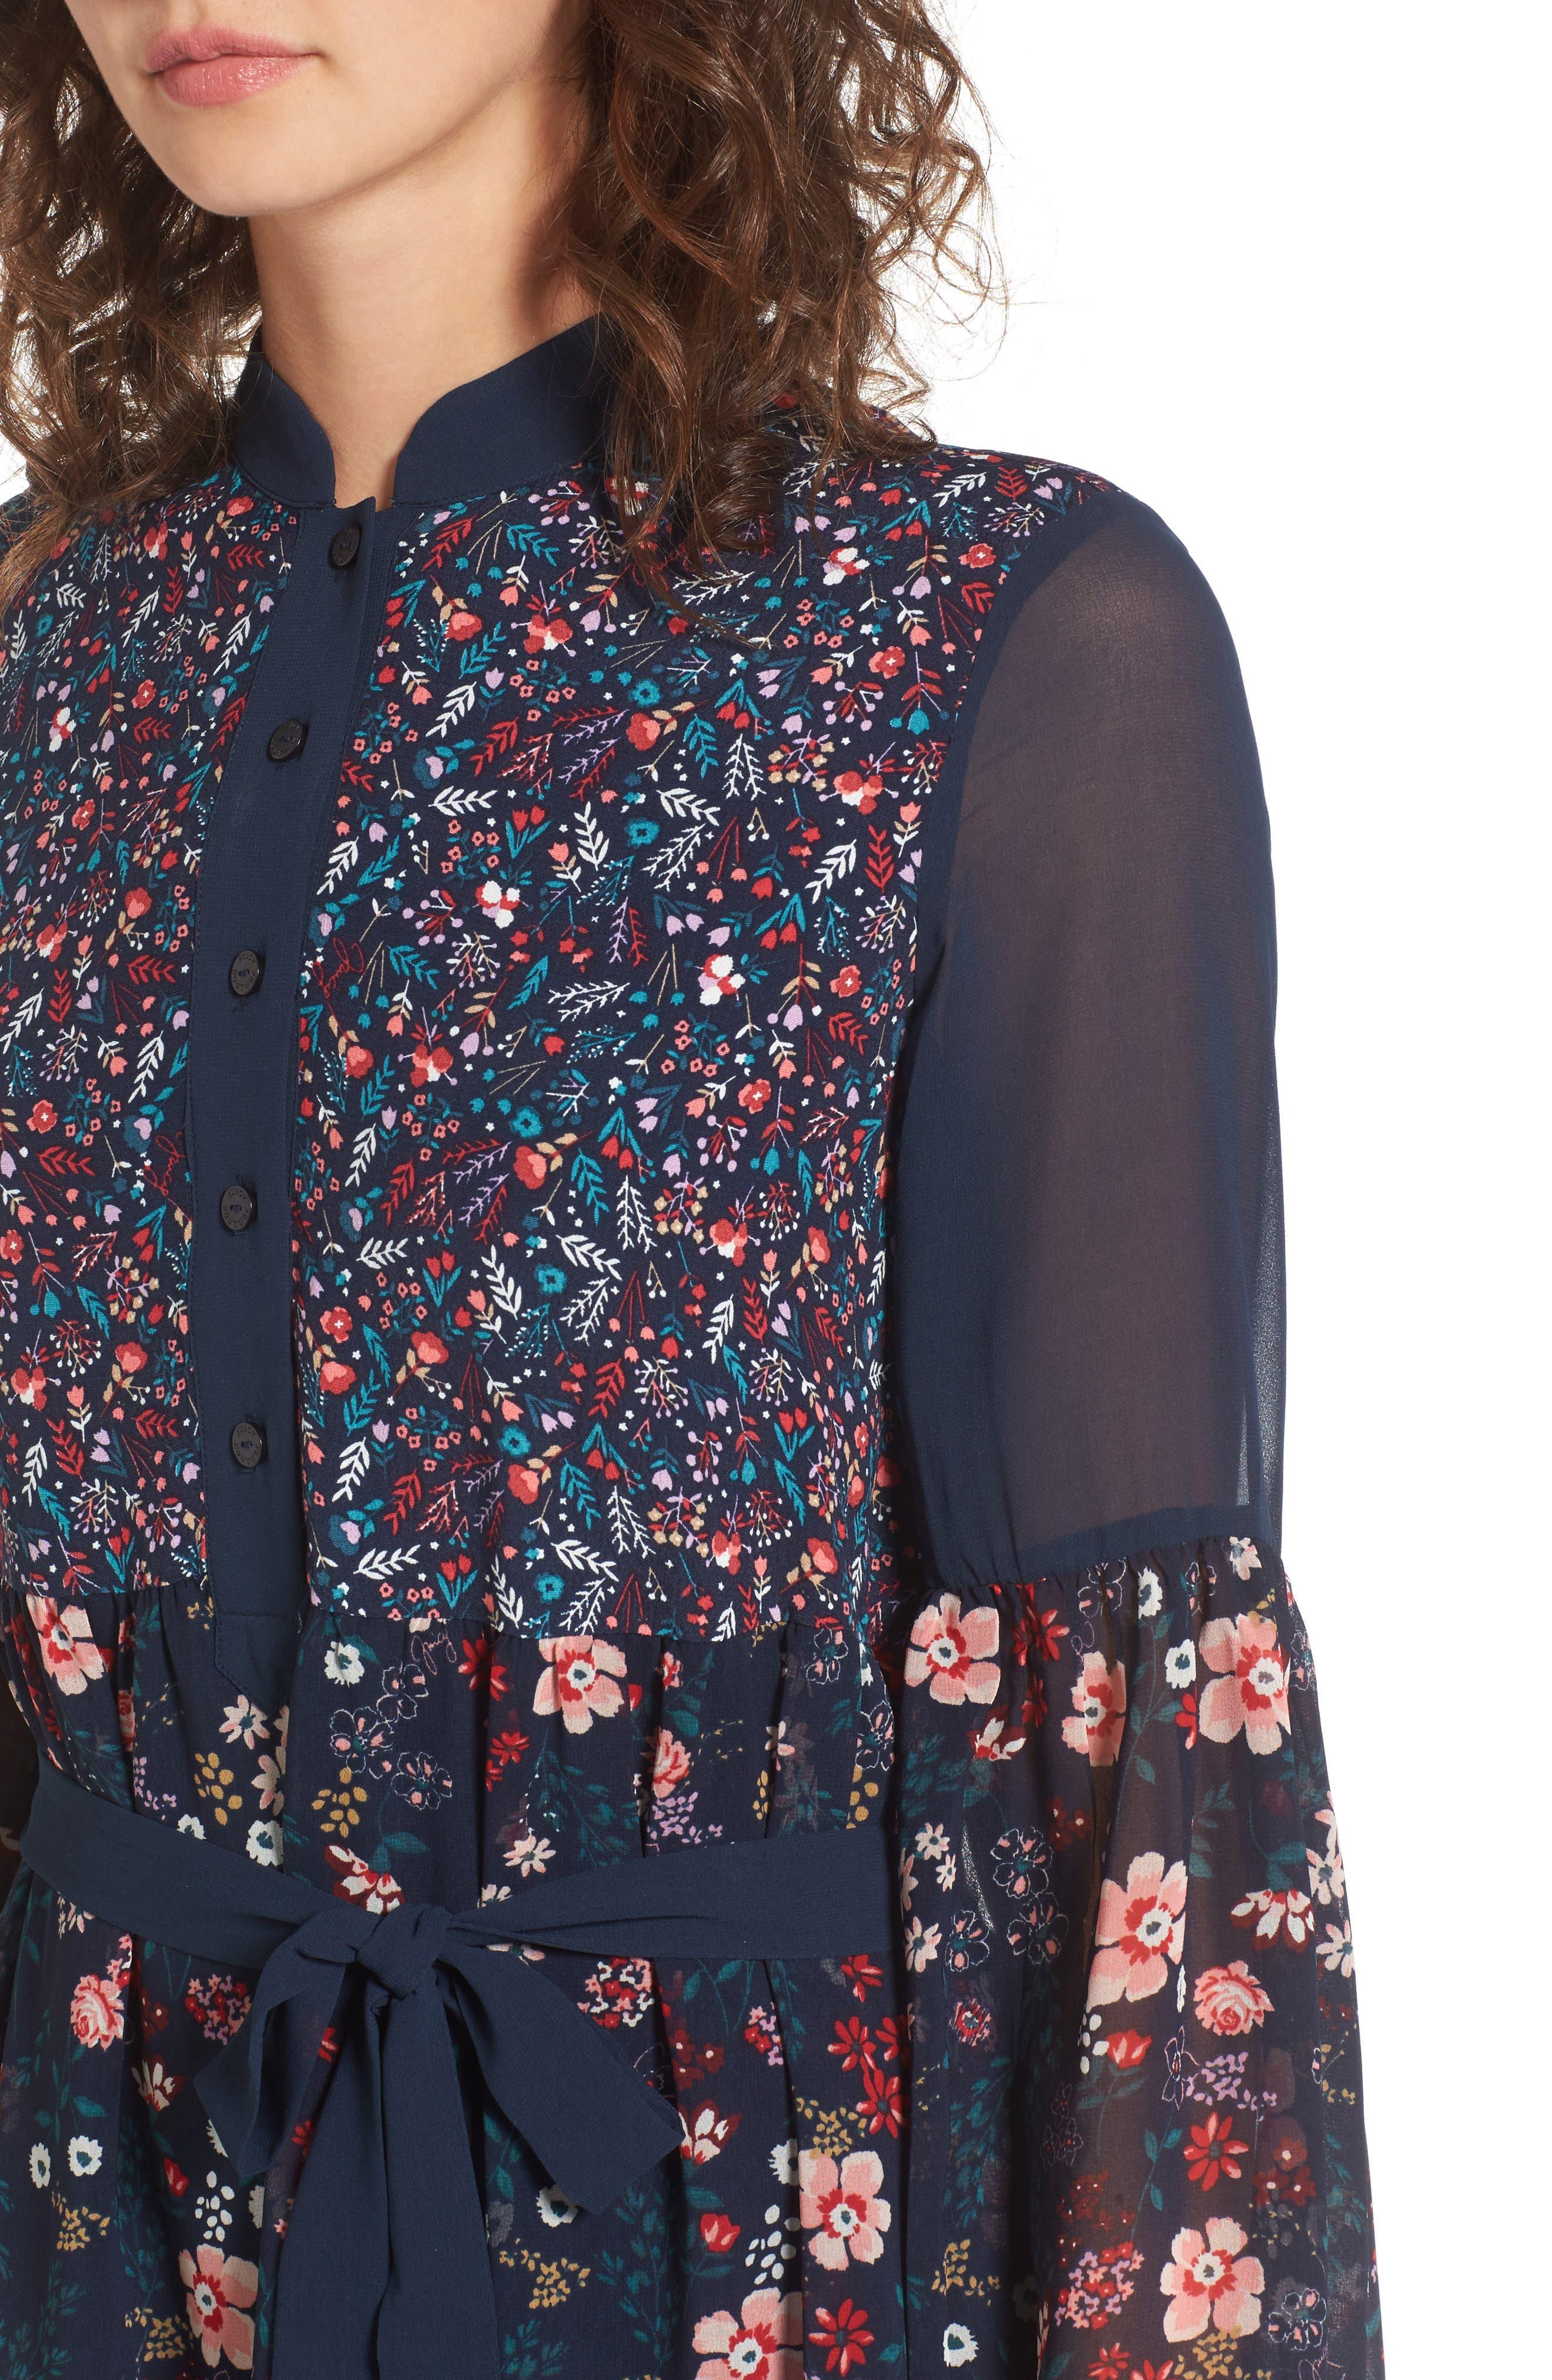 Caprice Floral Mix Shirtdress,                             Alternate thumbnail 4, color,                             497